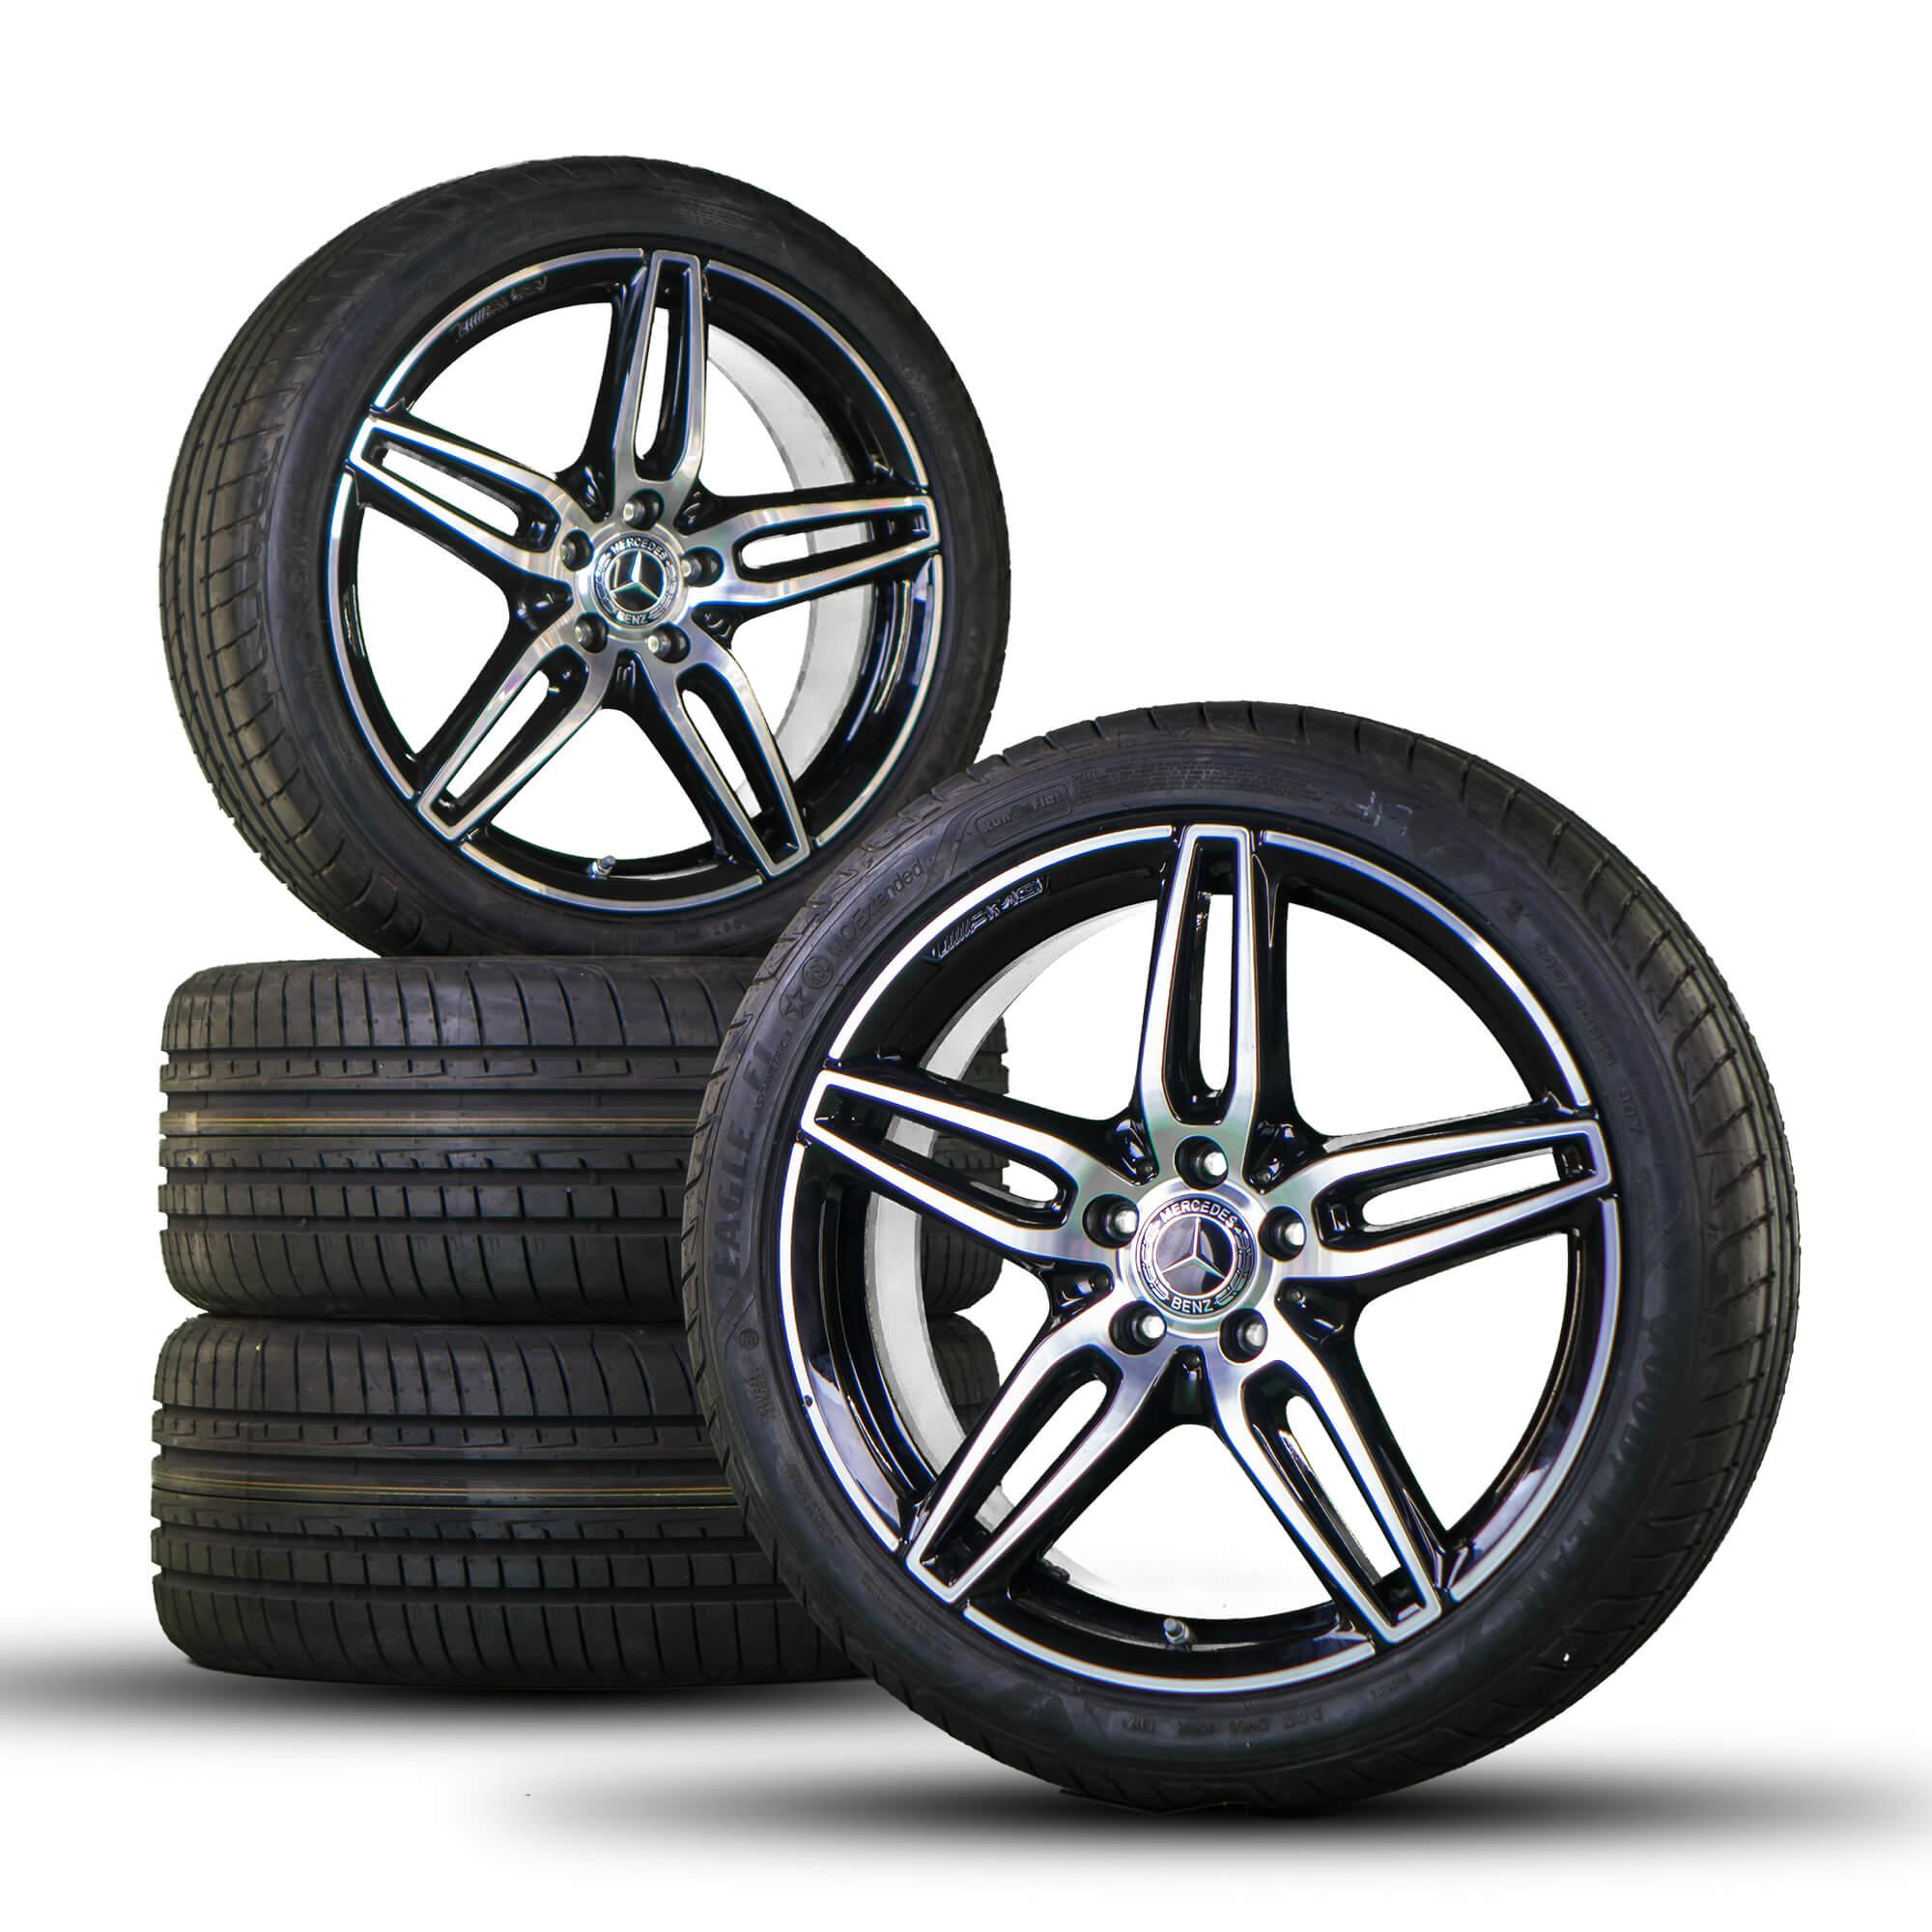 Mercedes Benz Rims >> Details About Amg 19 Inch Mercedes Benz Rims E Class W213 S213 Alloy Rims Summer Wheels New